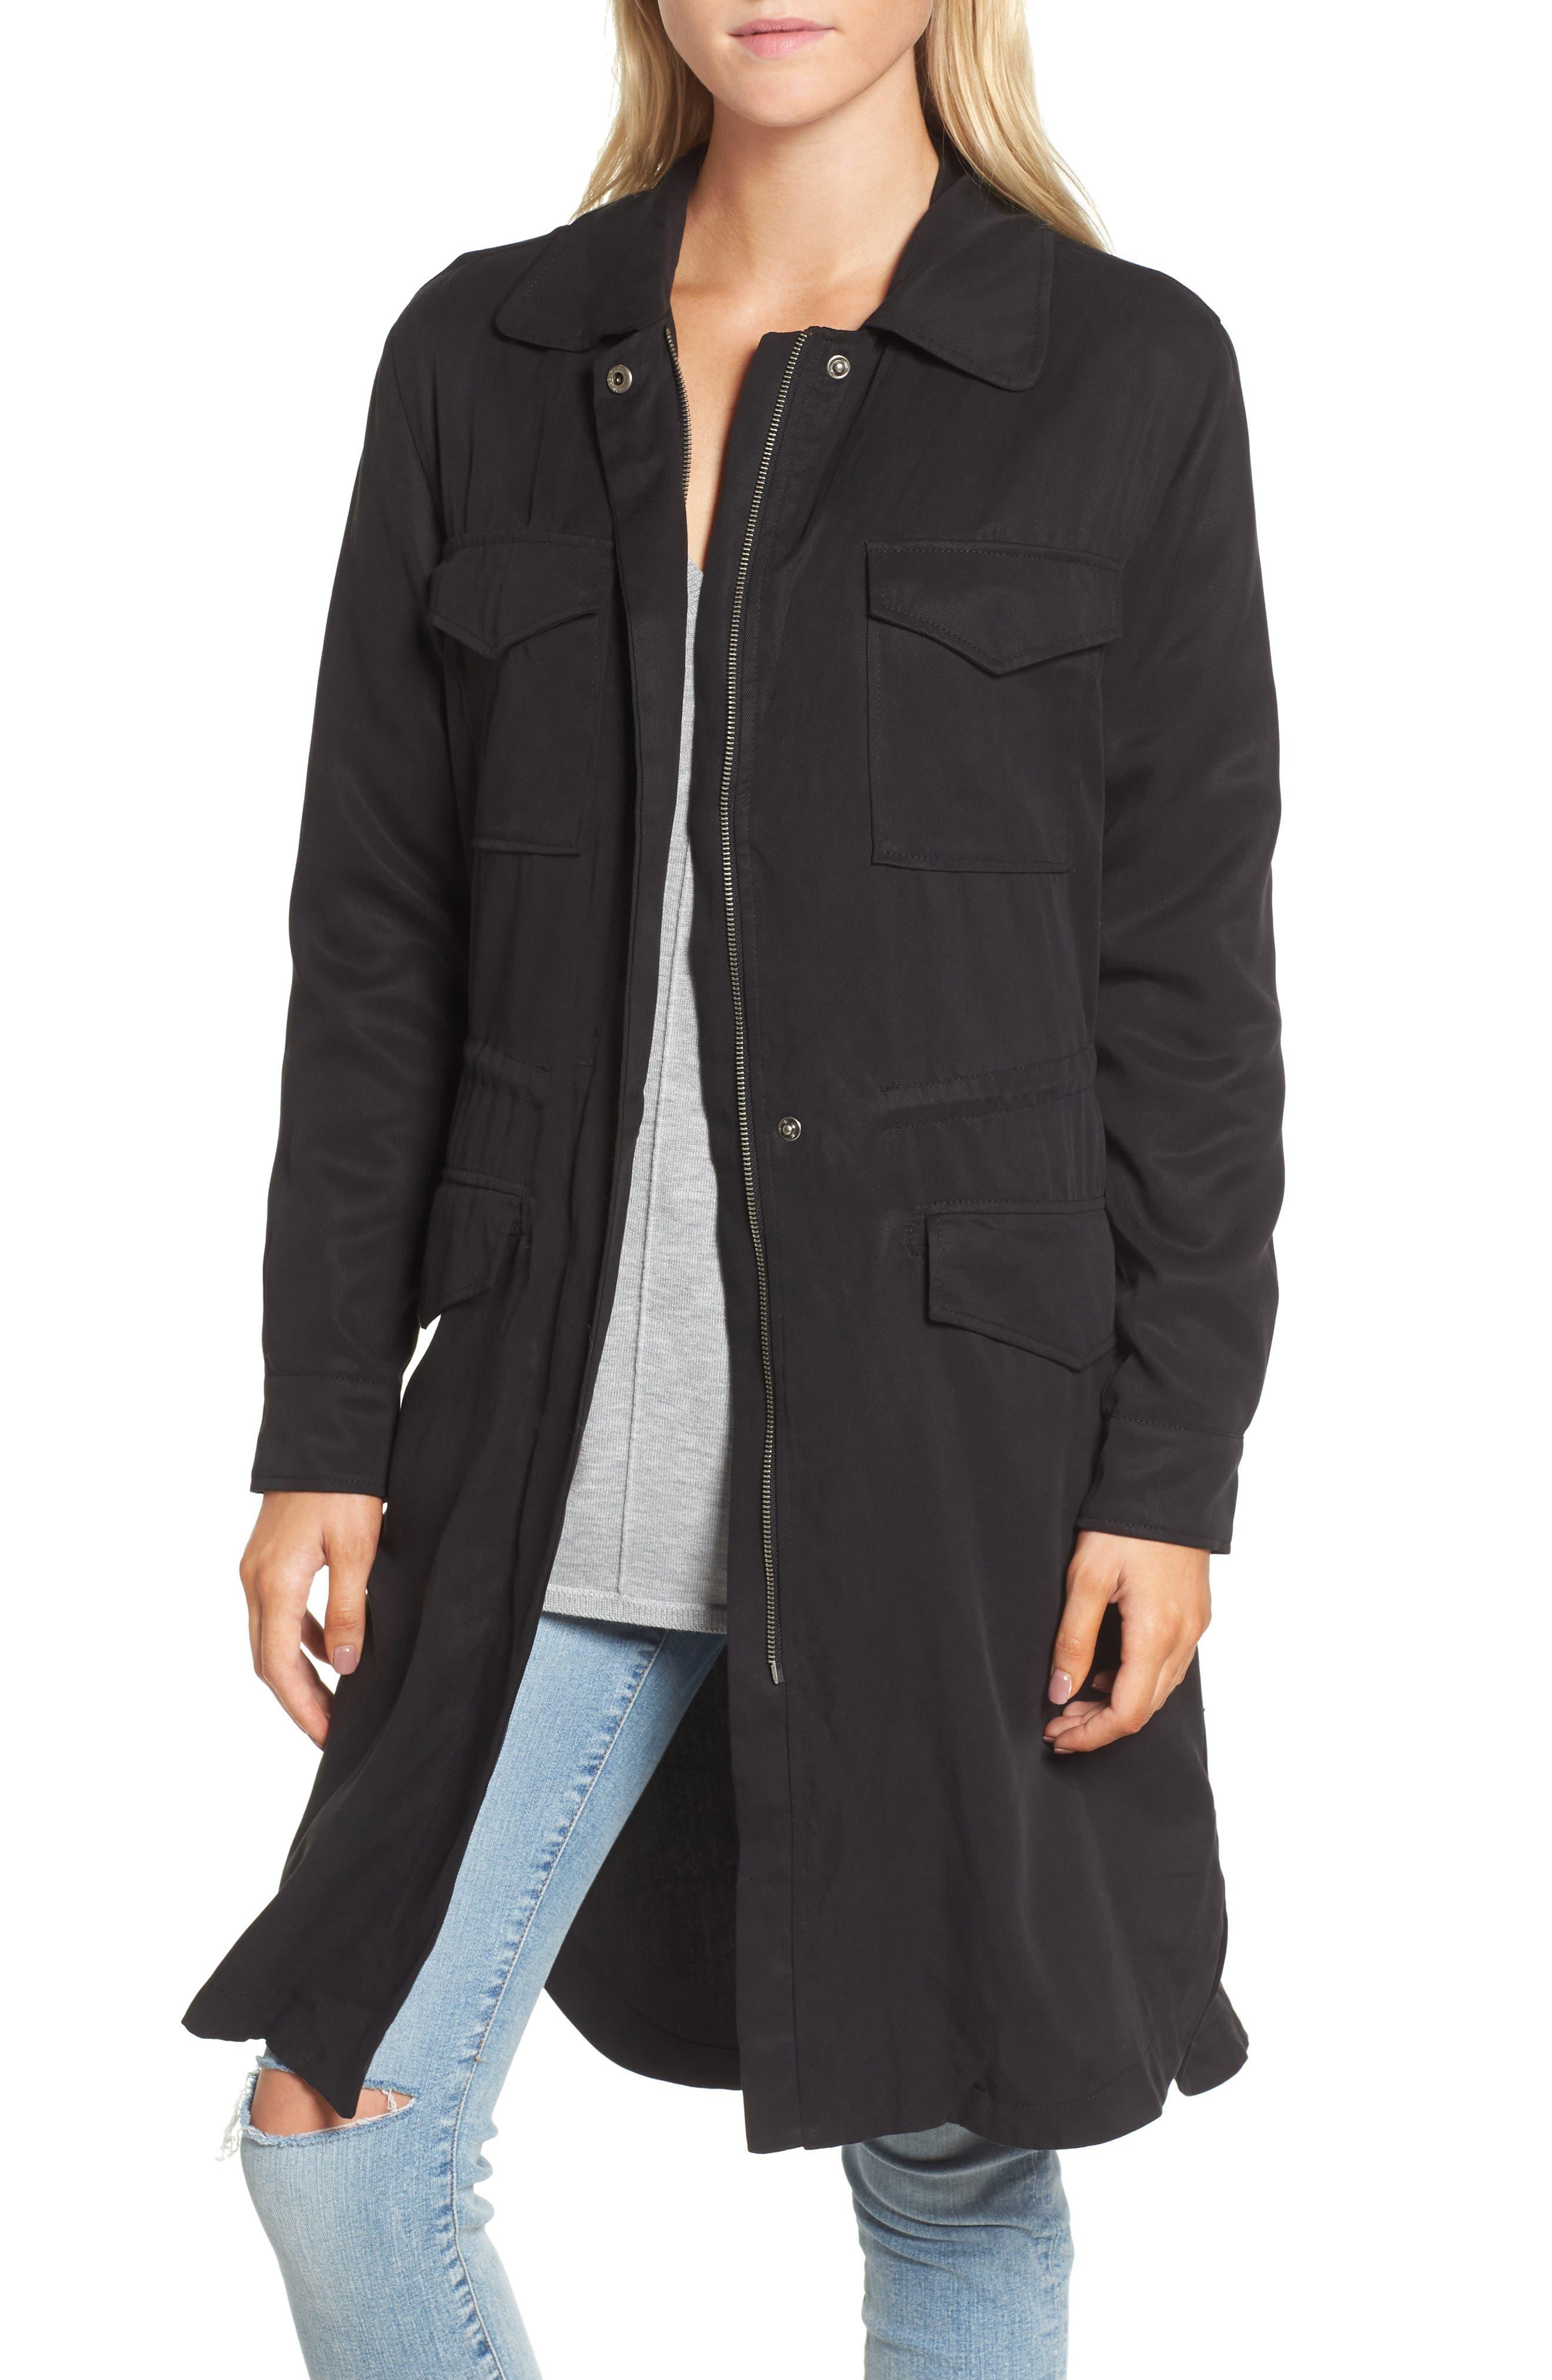 Walsh Tencel<sup>®</sup> Coat with Detachable Hooded Faux Fur Vest,                             Alternate thumbnail 4, color,                             001